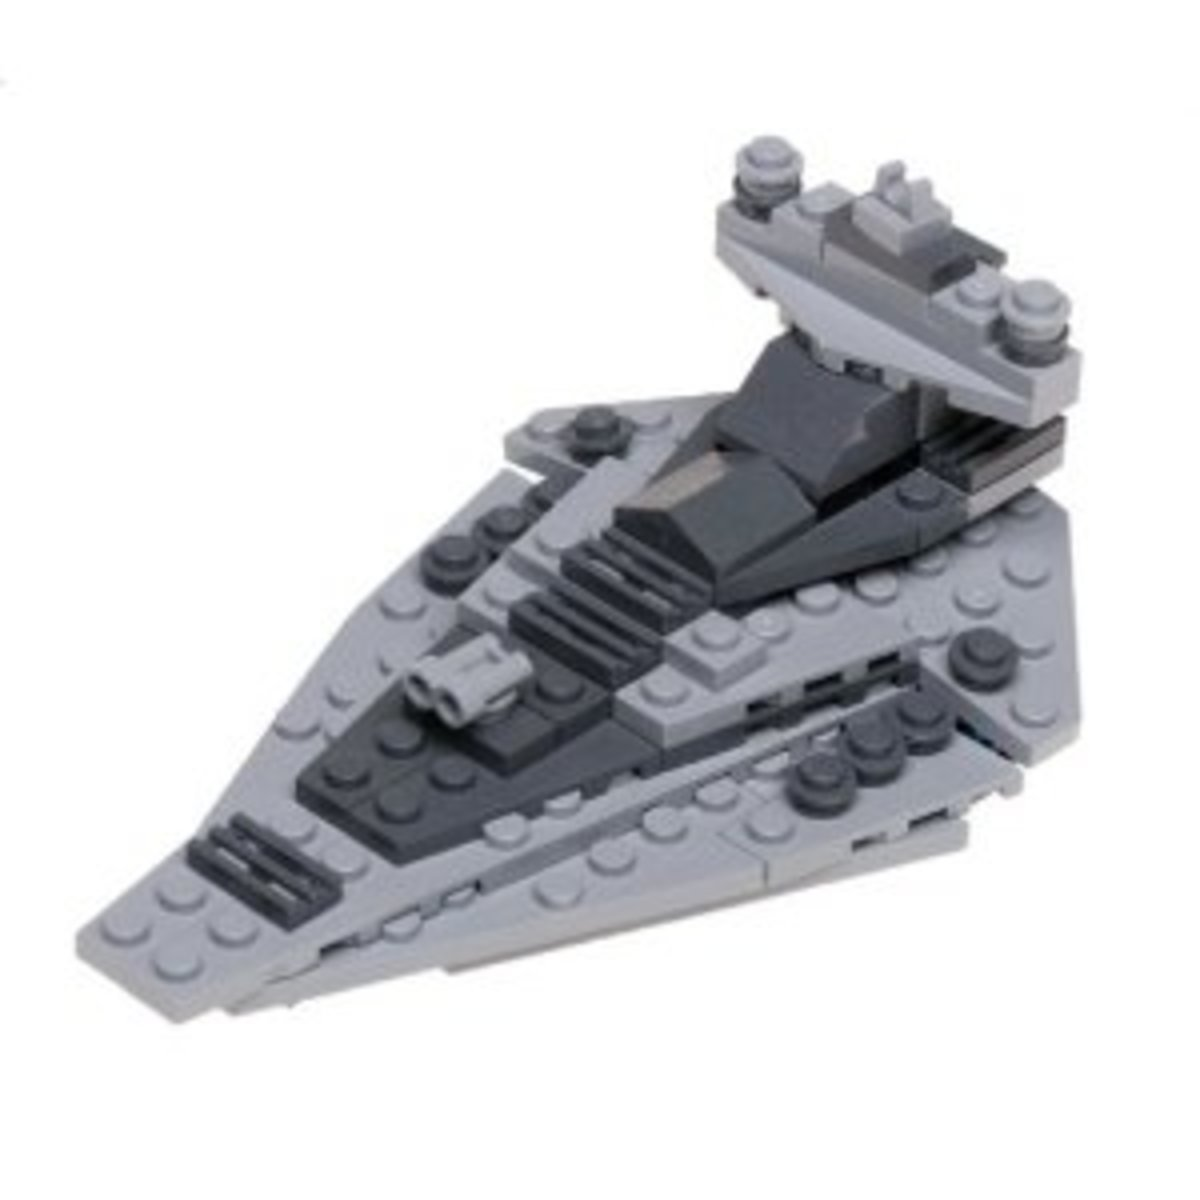 LEGO Star Wars Star Destroyer 4492 Assembled